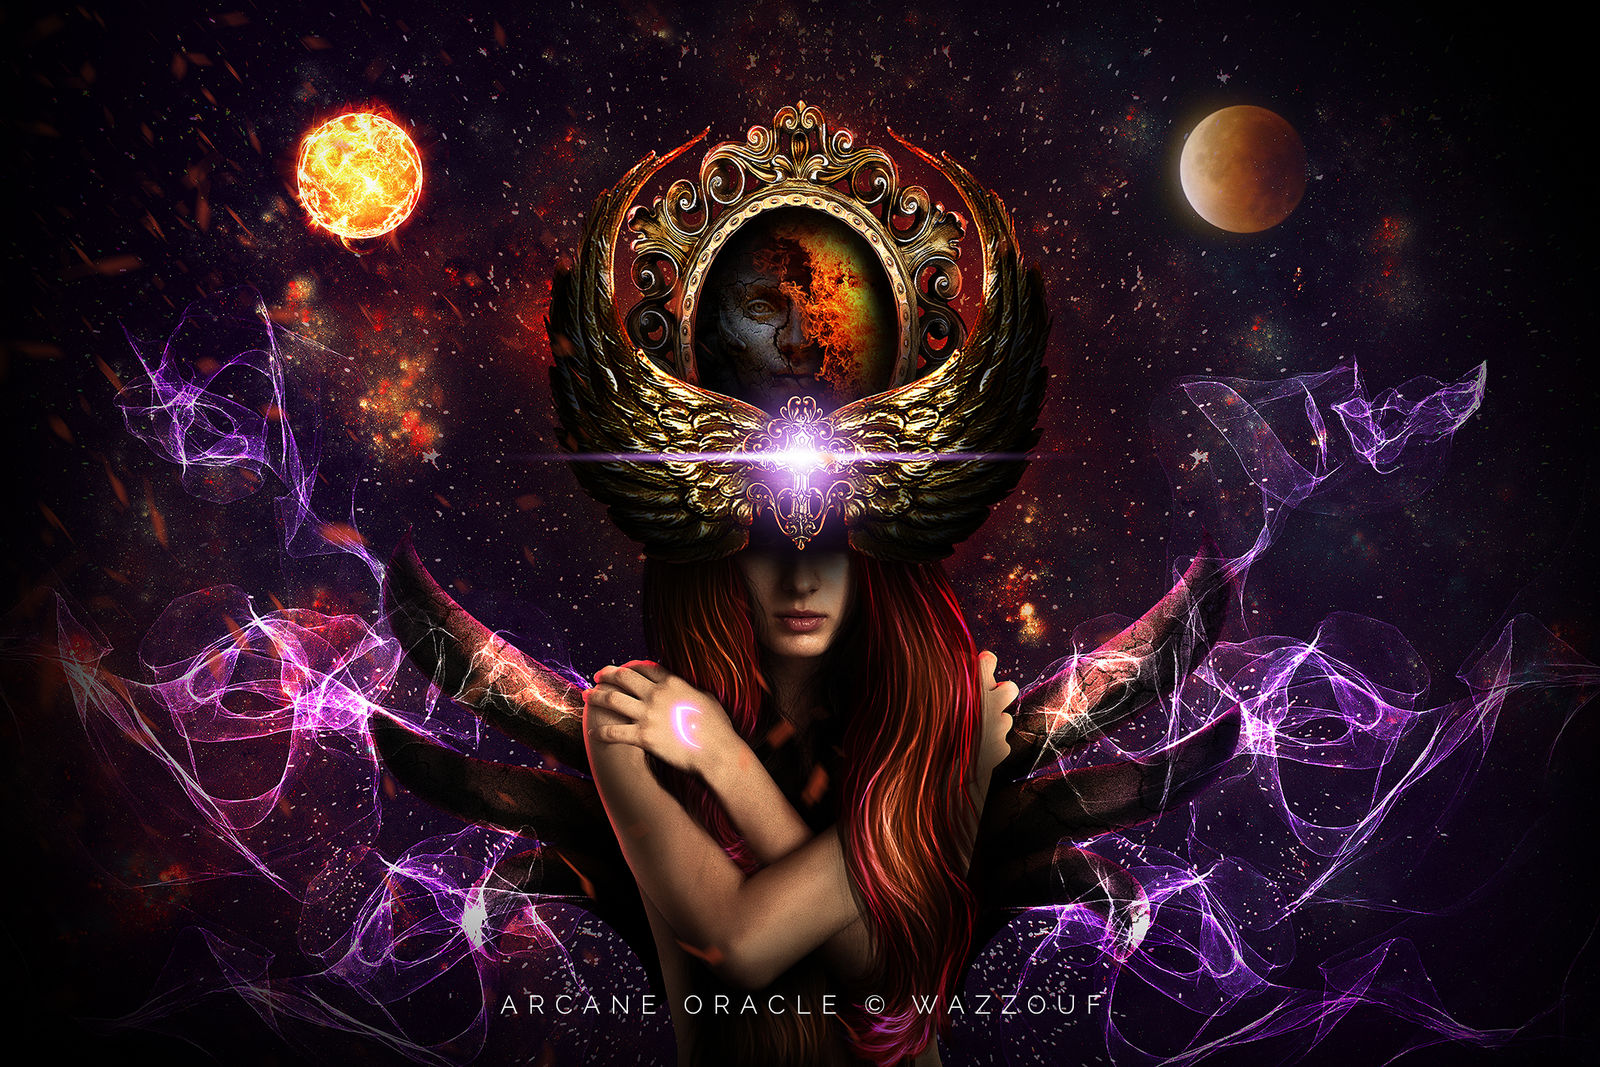 Arcane Oracle by Wazzouf